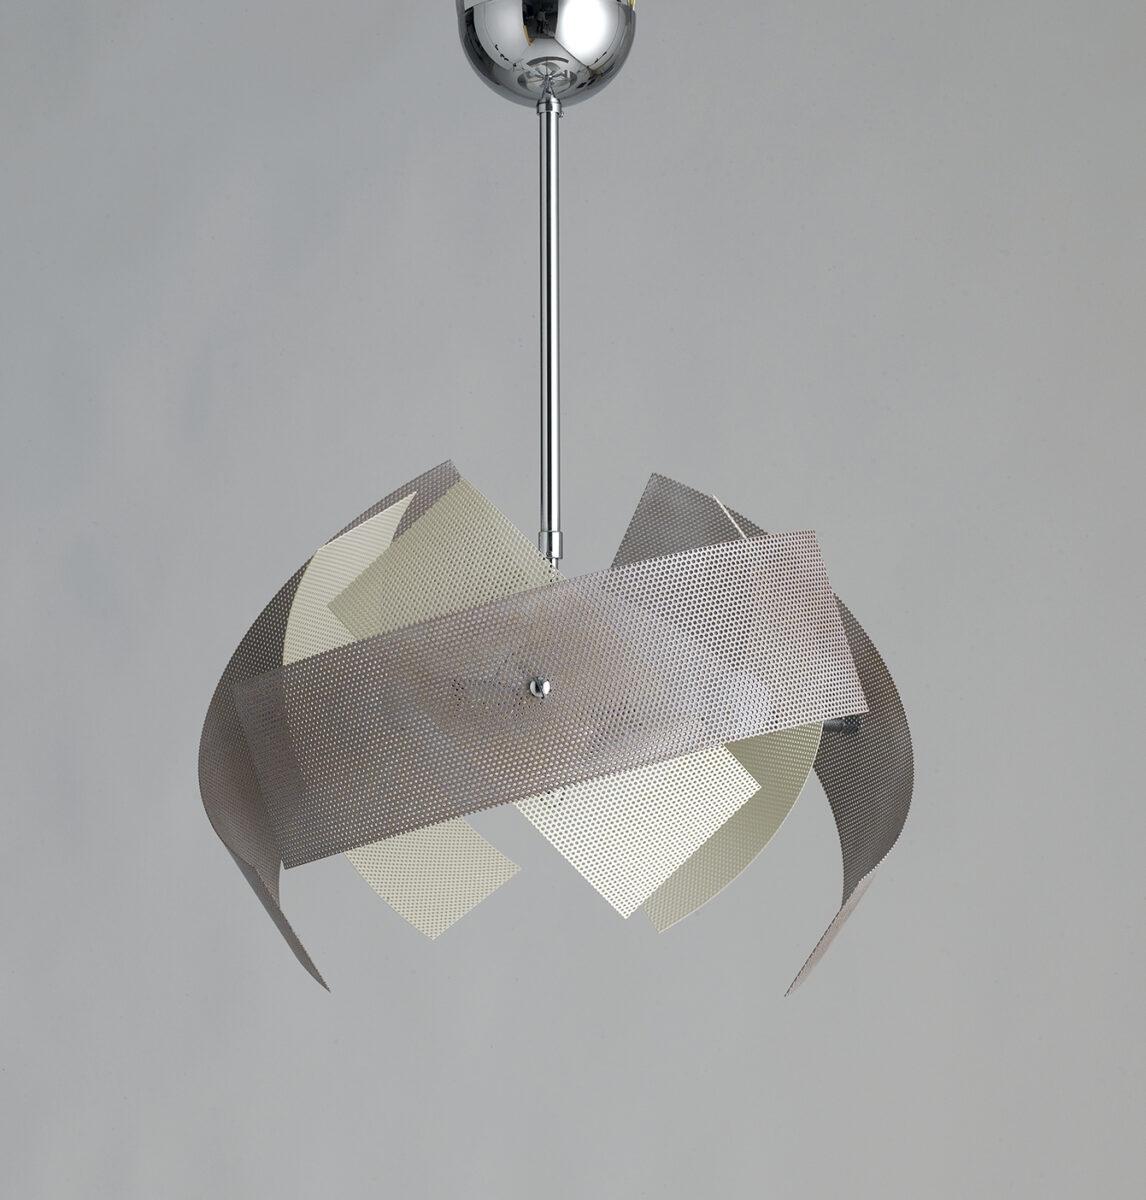 Lampadari moderni leroy merlin - Lampadario per bagno ...